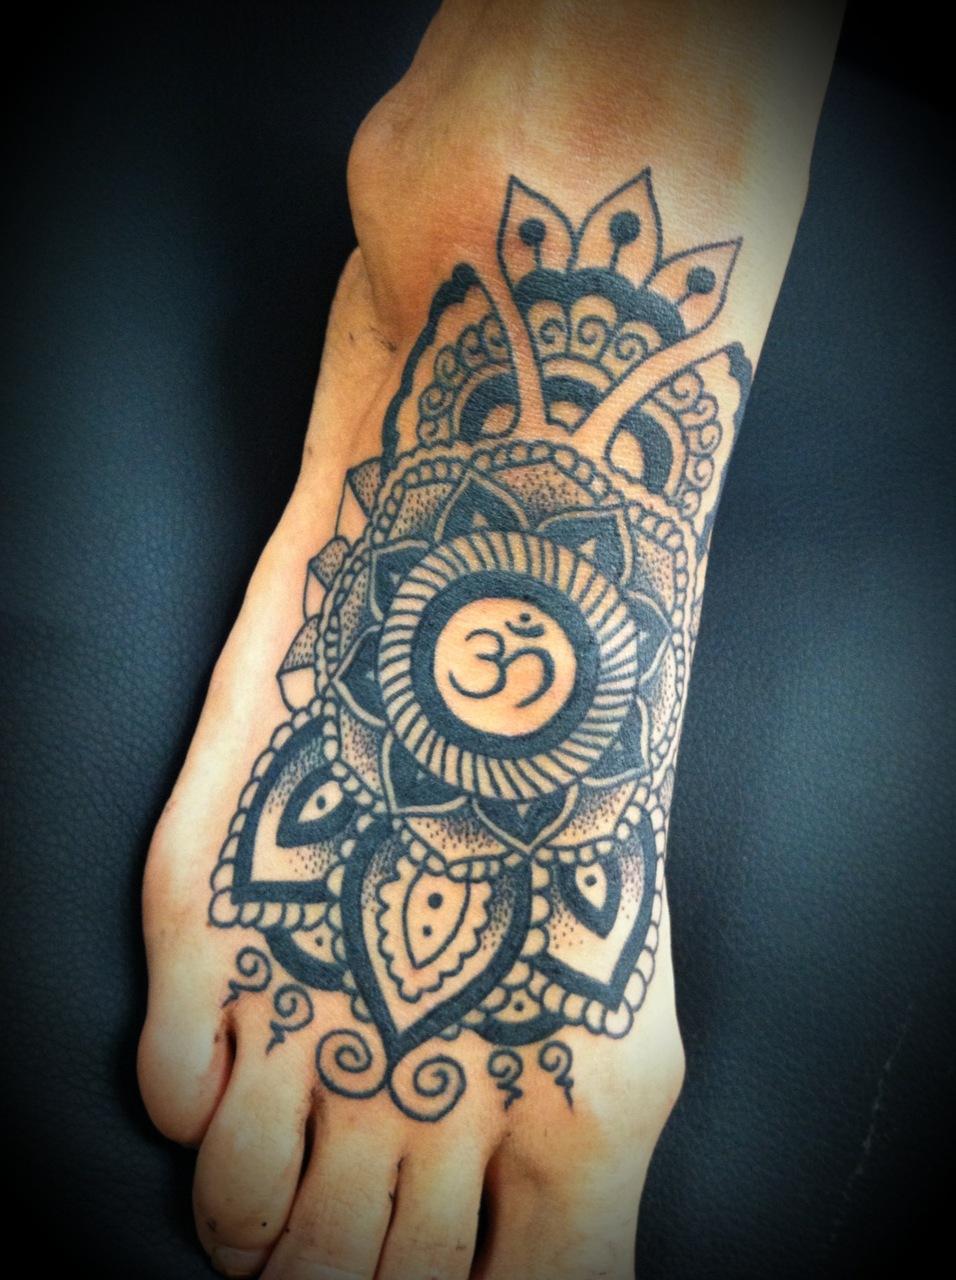 Тату с буддийским символом